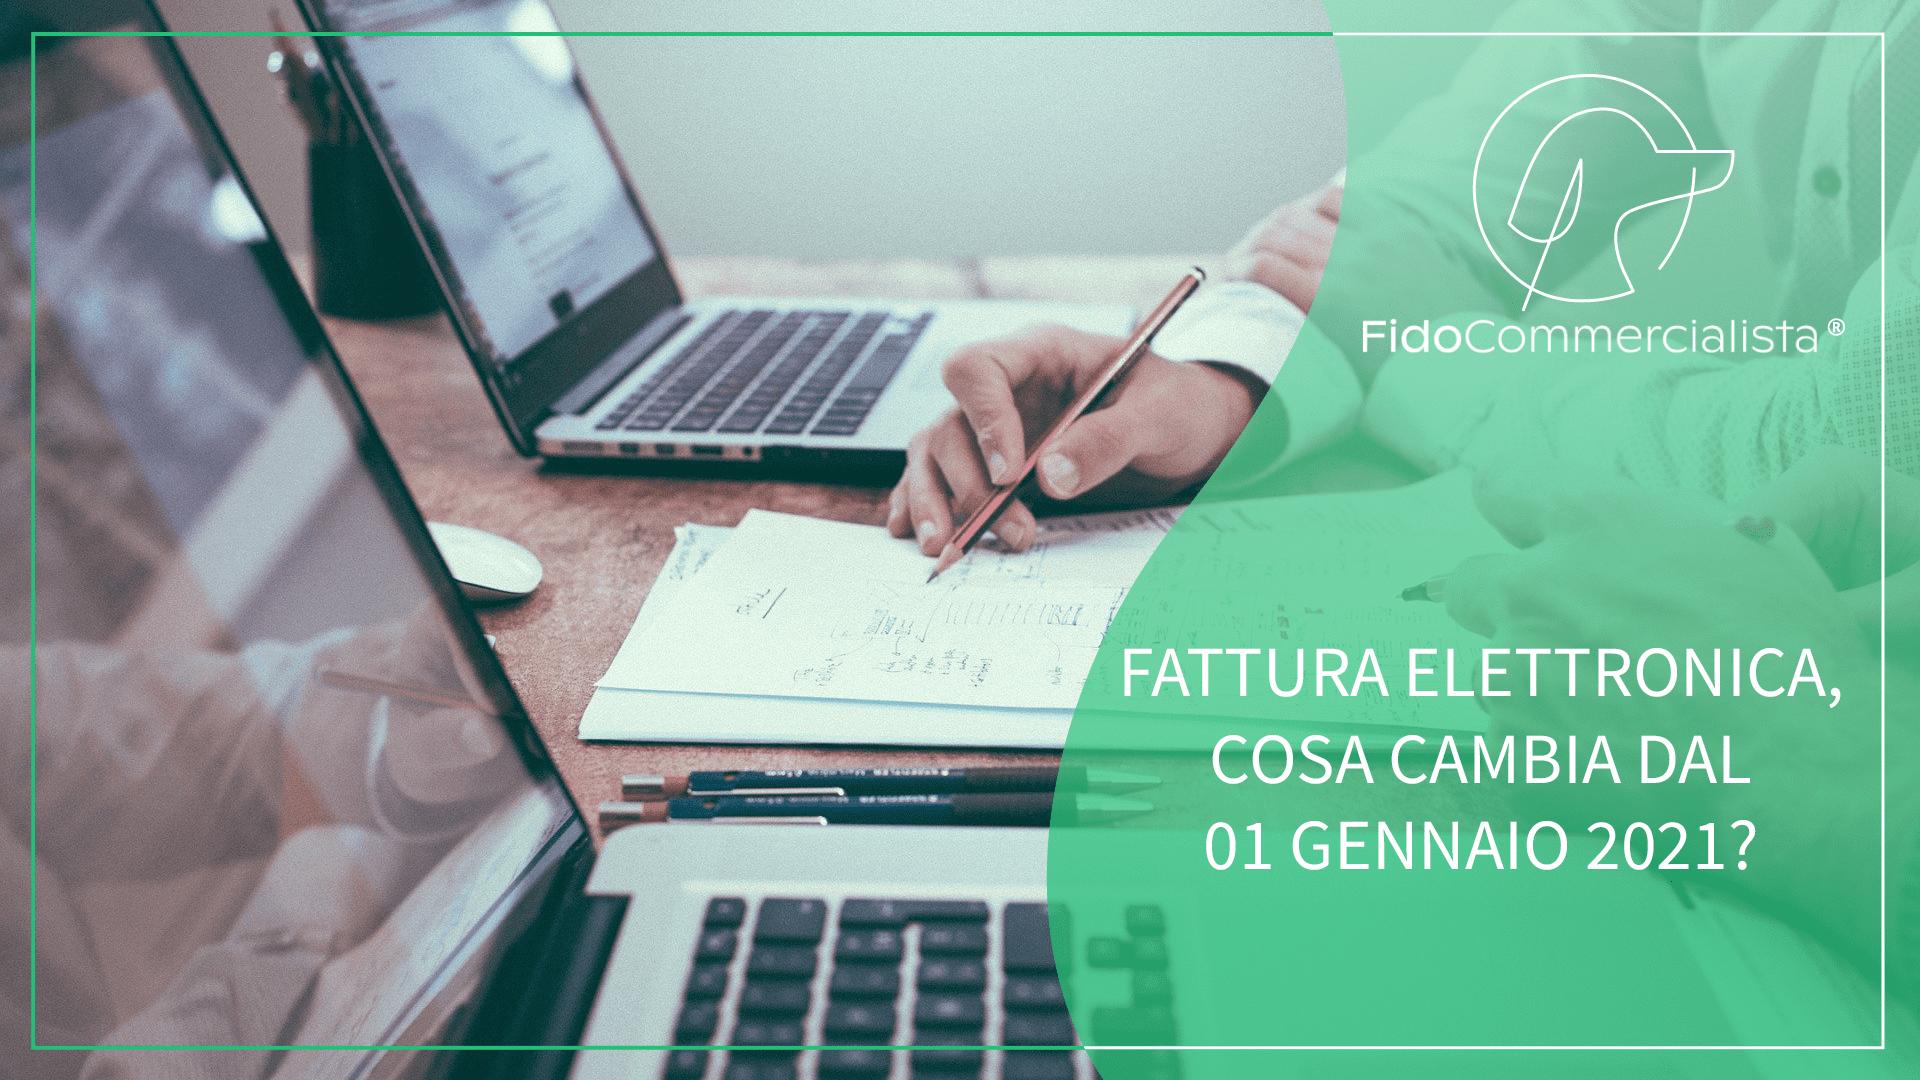 FATTURA ELETTRONICA BIS (1)